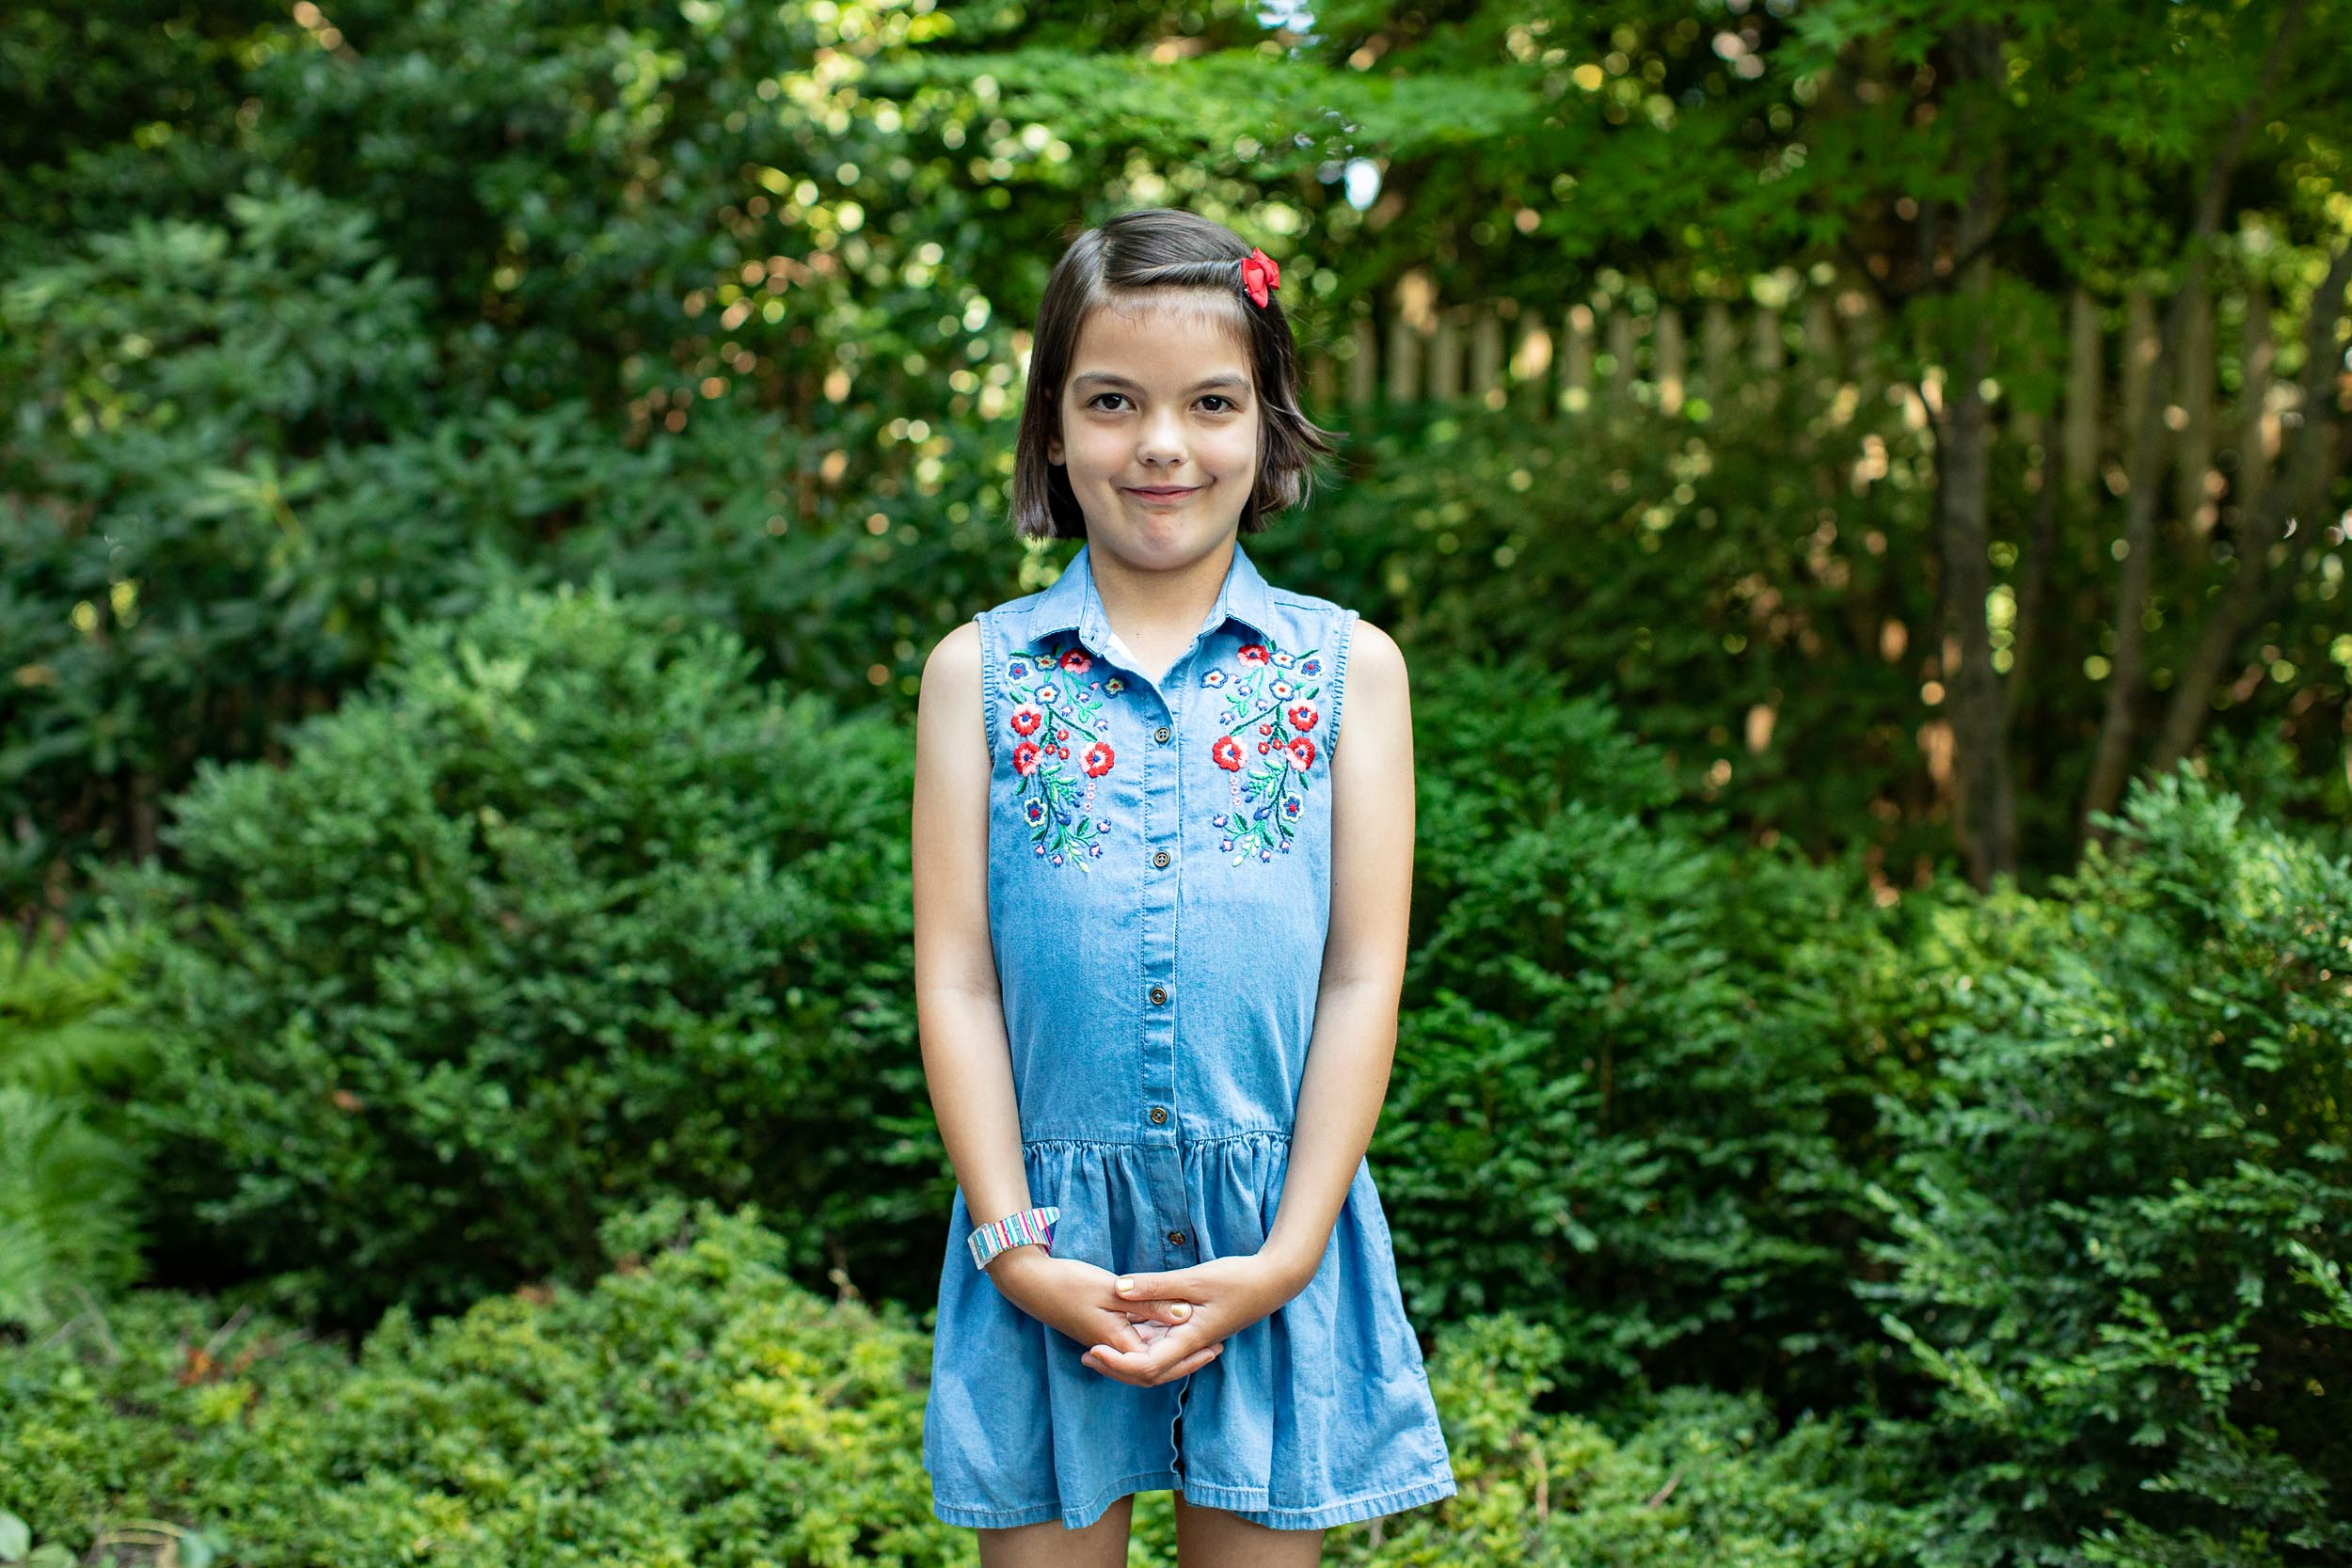 Chevy Chase MD Backyard Family Portraits Maryland Photography Tara Parekh Photography -03.jpg